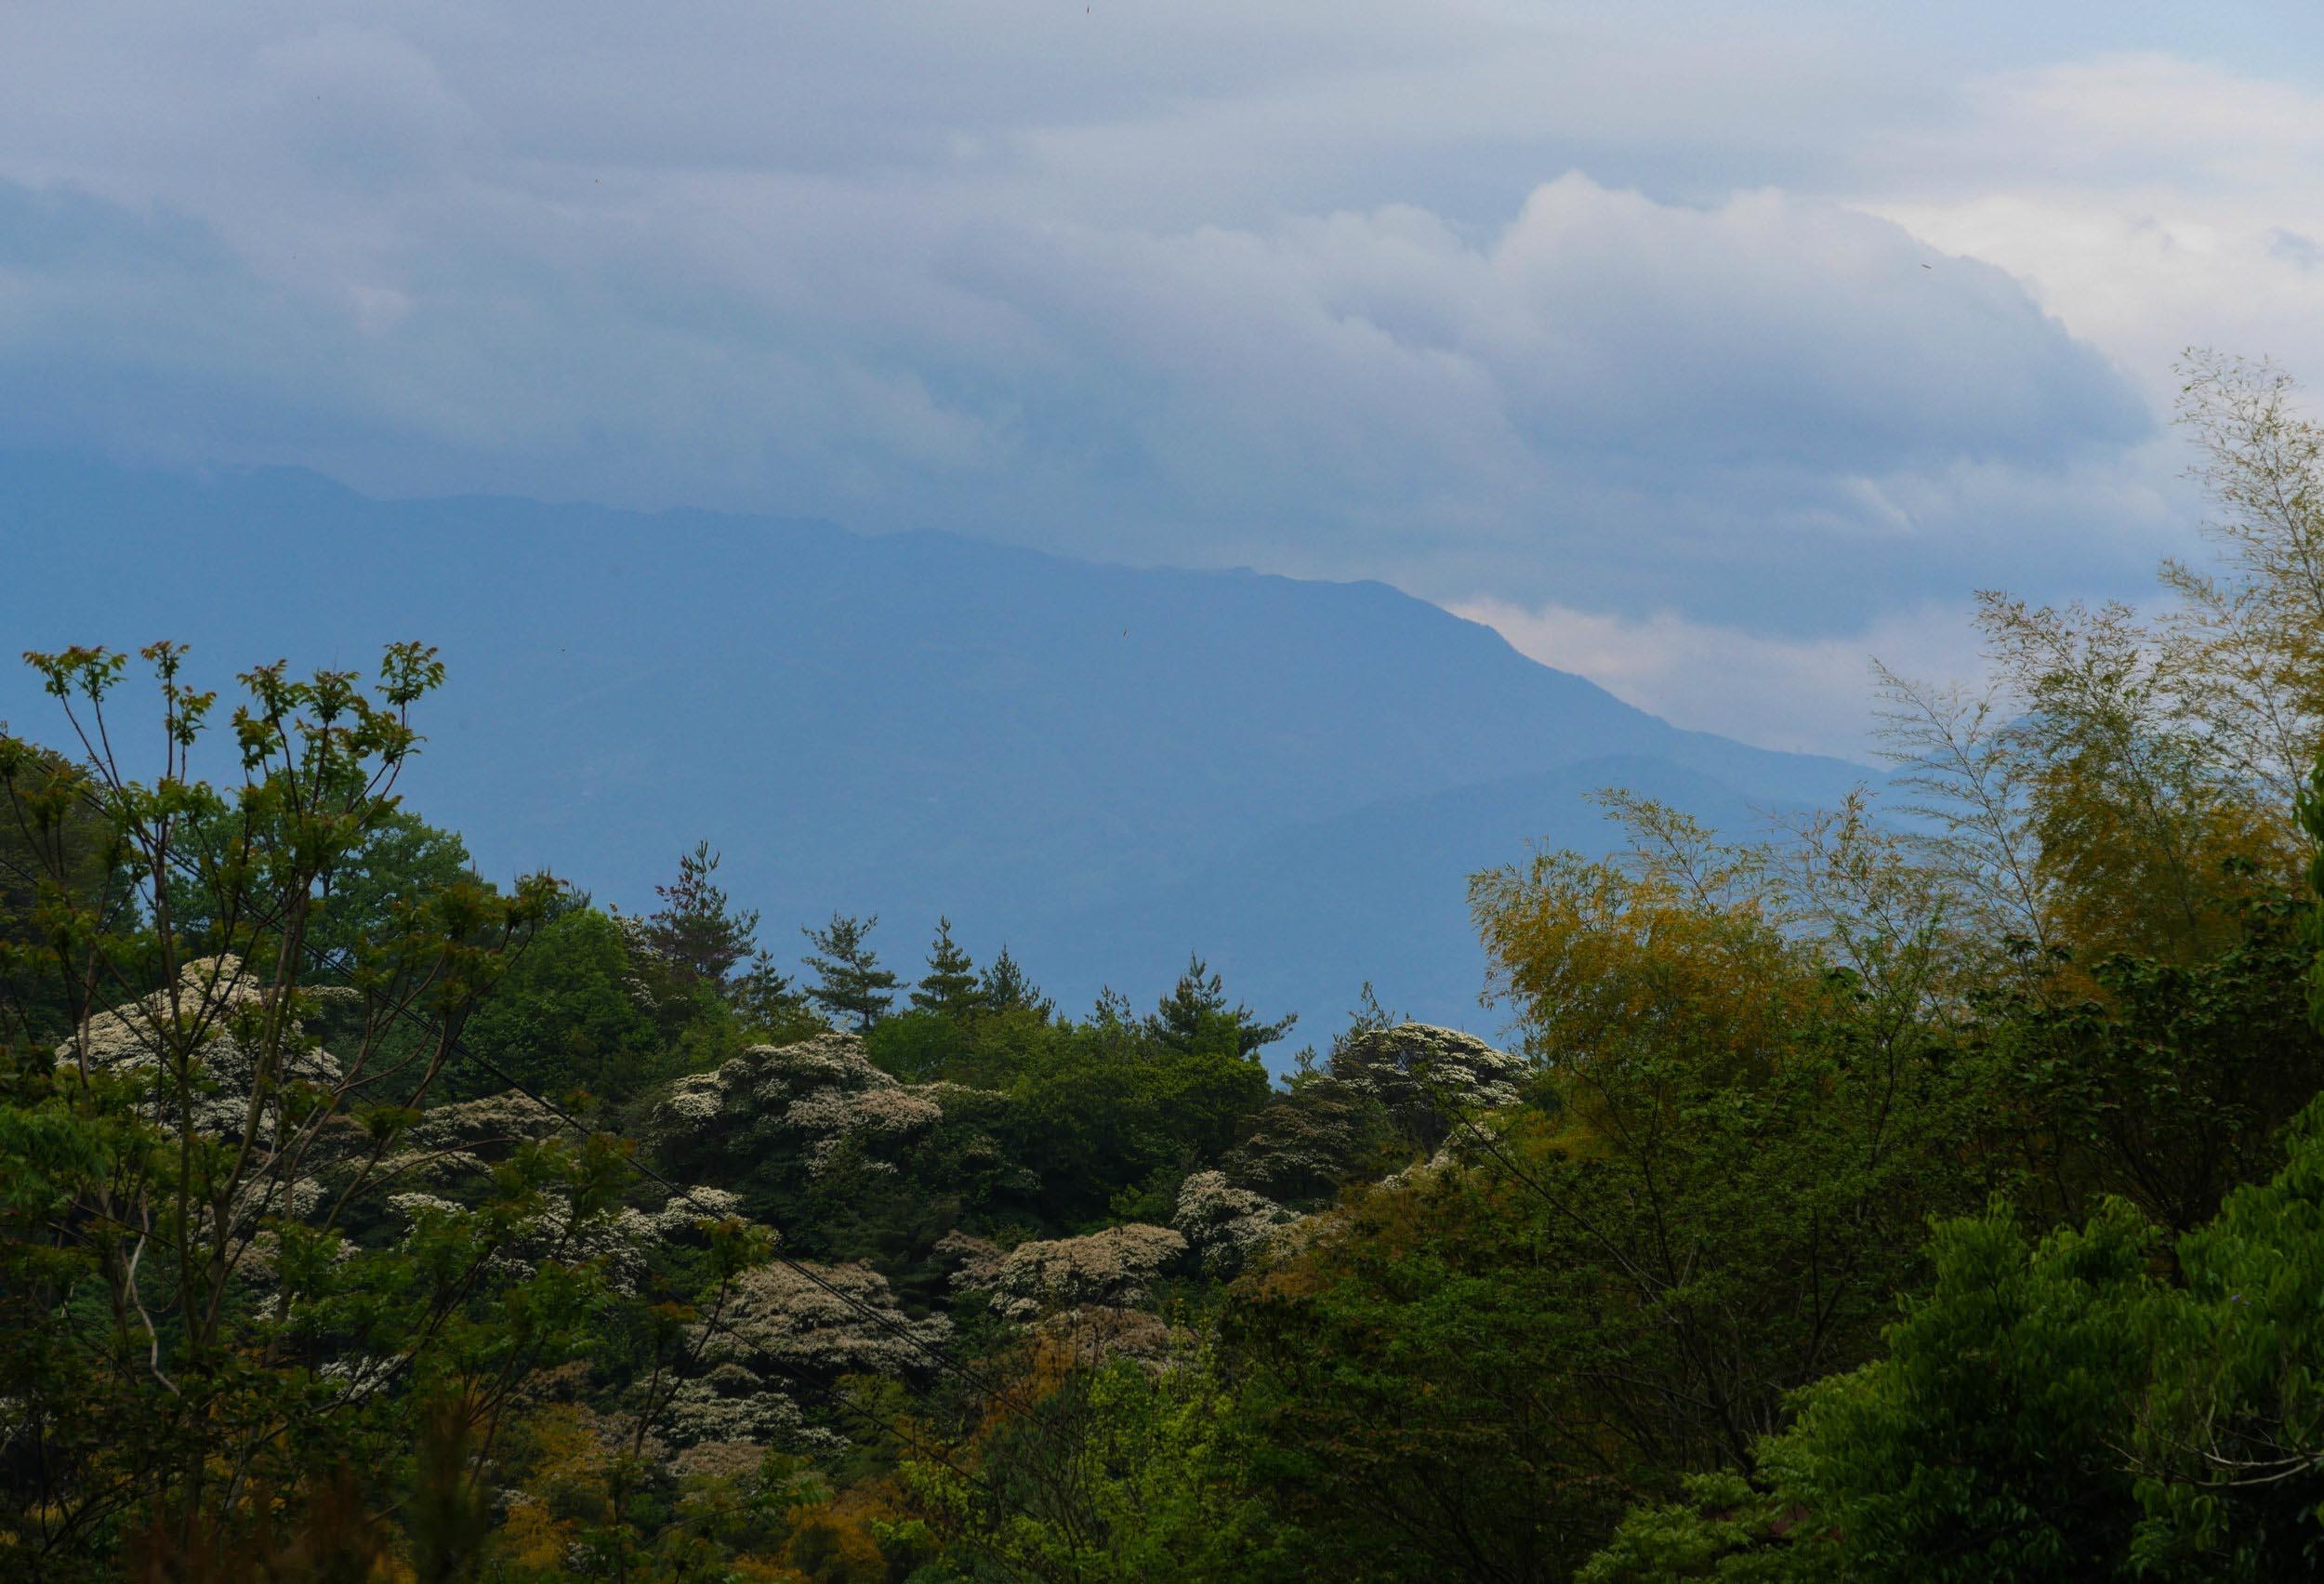 matsuyama-dougo-onsen-42.jpg